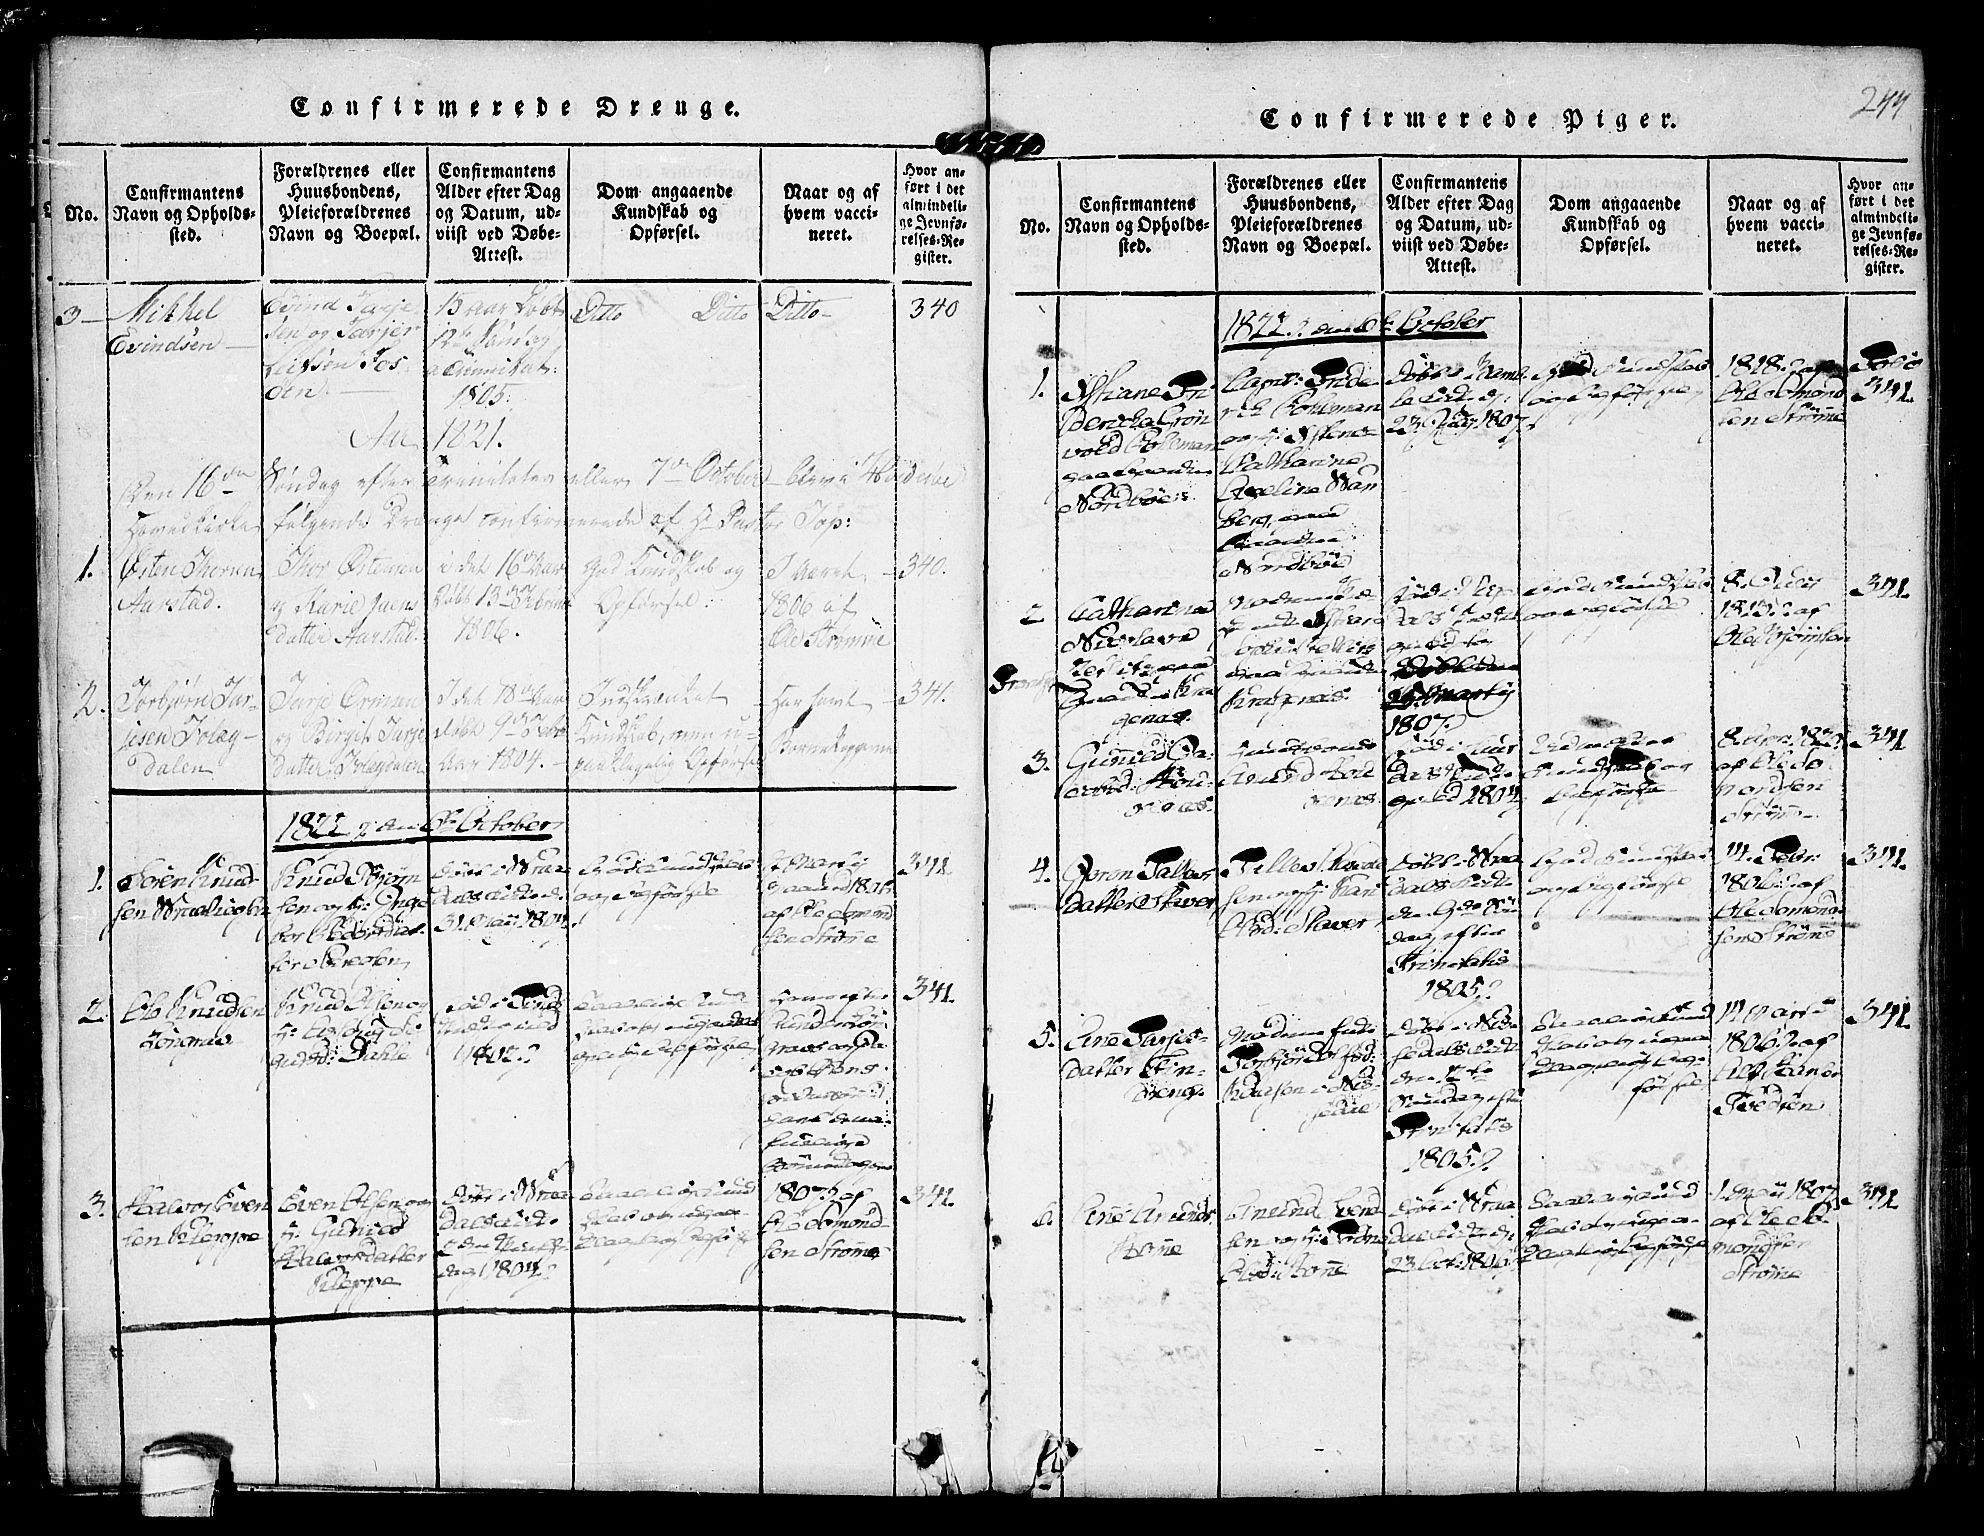 SAKO, Kviteseid kirkebøker, F/Fc/L0001: Ministerialbok nr. III 1, 1815-1836, s. 244